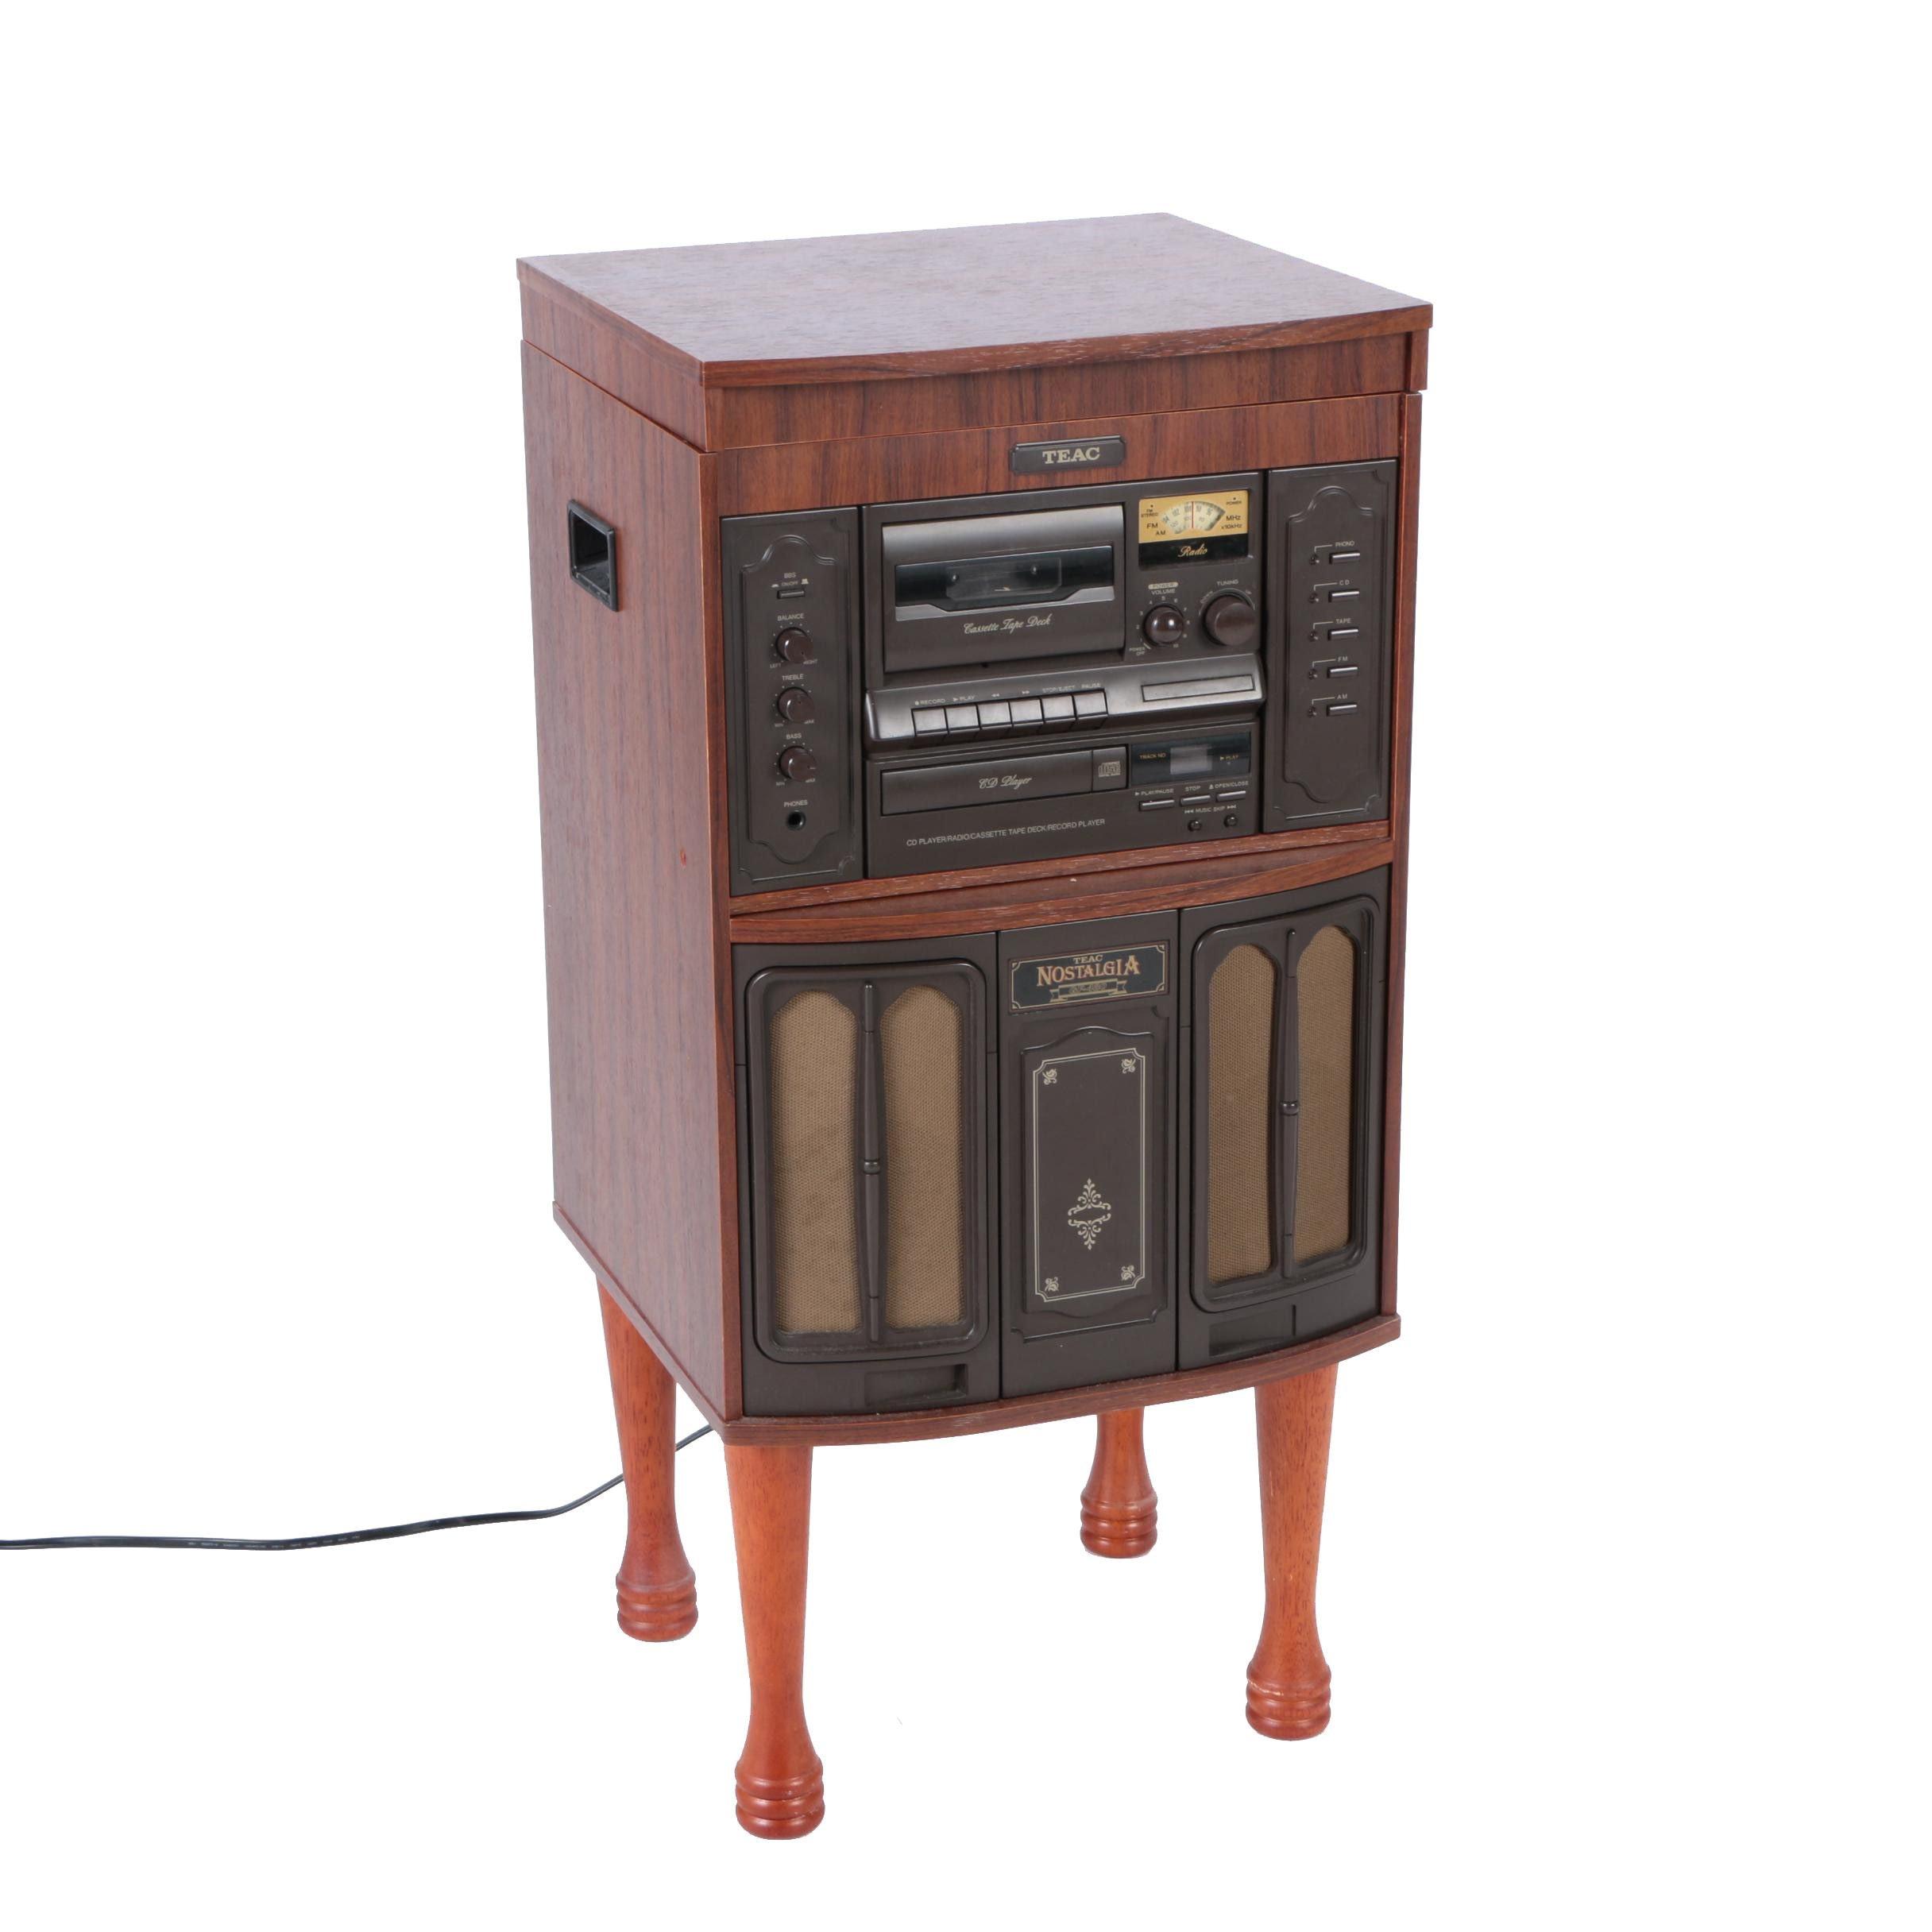 Teac GF-480 Console Stereo